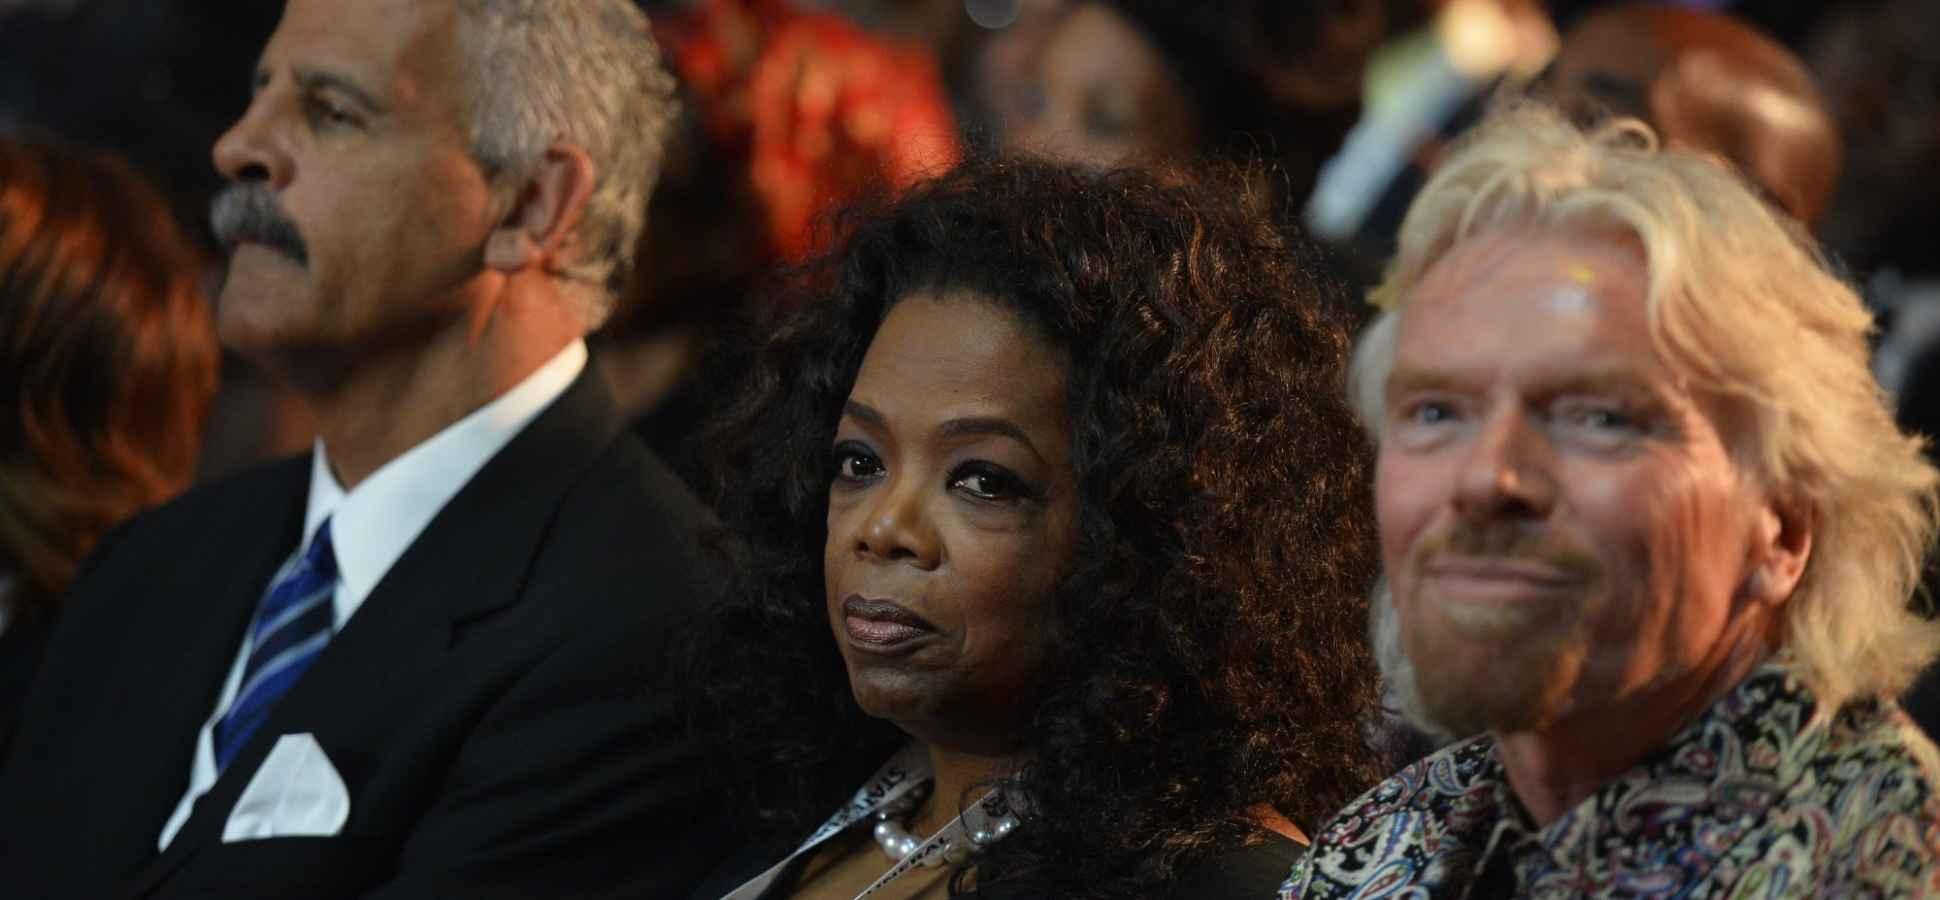 The Leadership Qualities Oprah Winfrey, Richard Branson, and Gandhi Have in Common